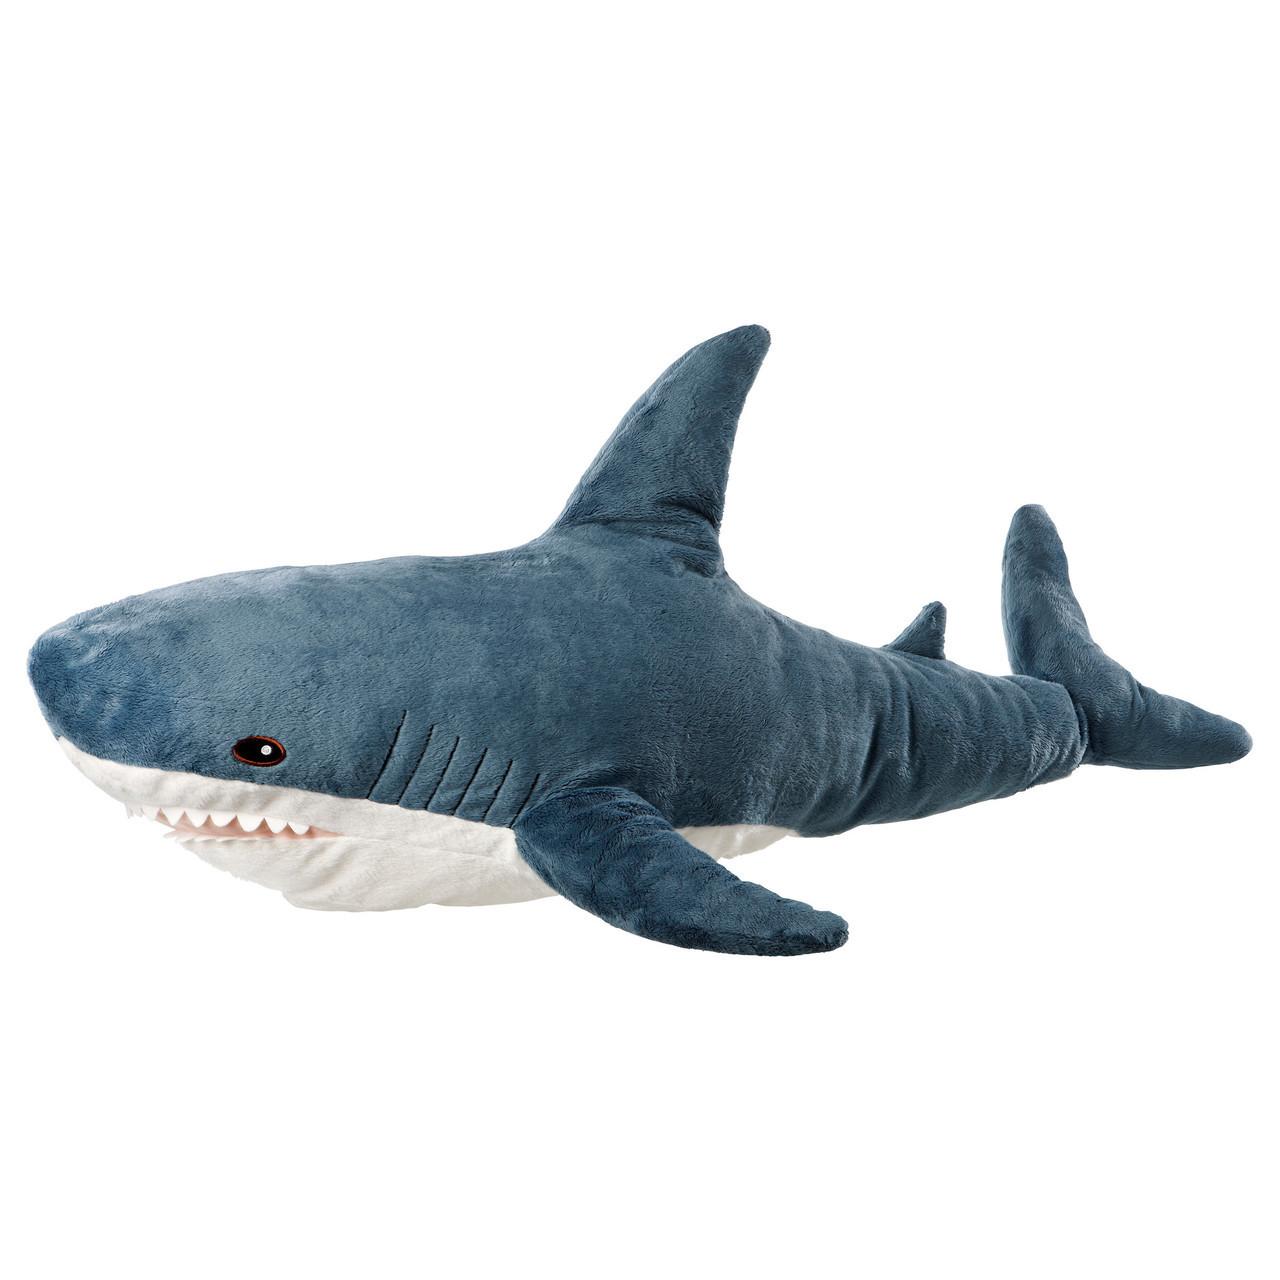 БЛОХЭЙ Мягкая игрушка, акула 30373588 IKEA, ИКЕА, BLÅHAJ